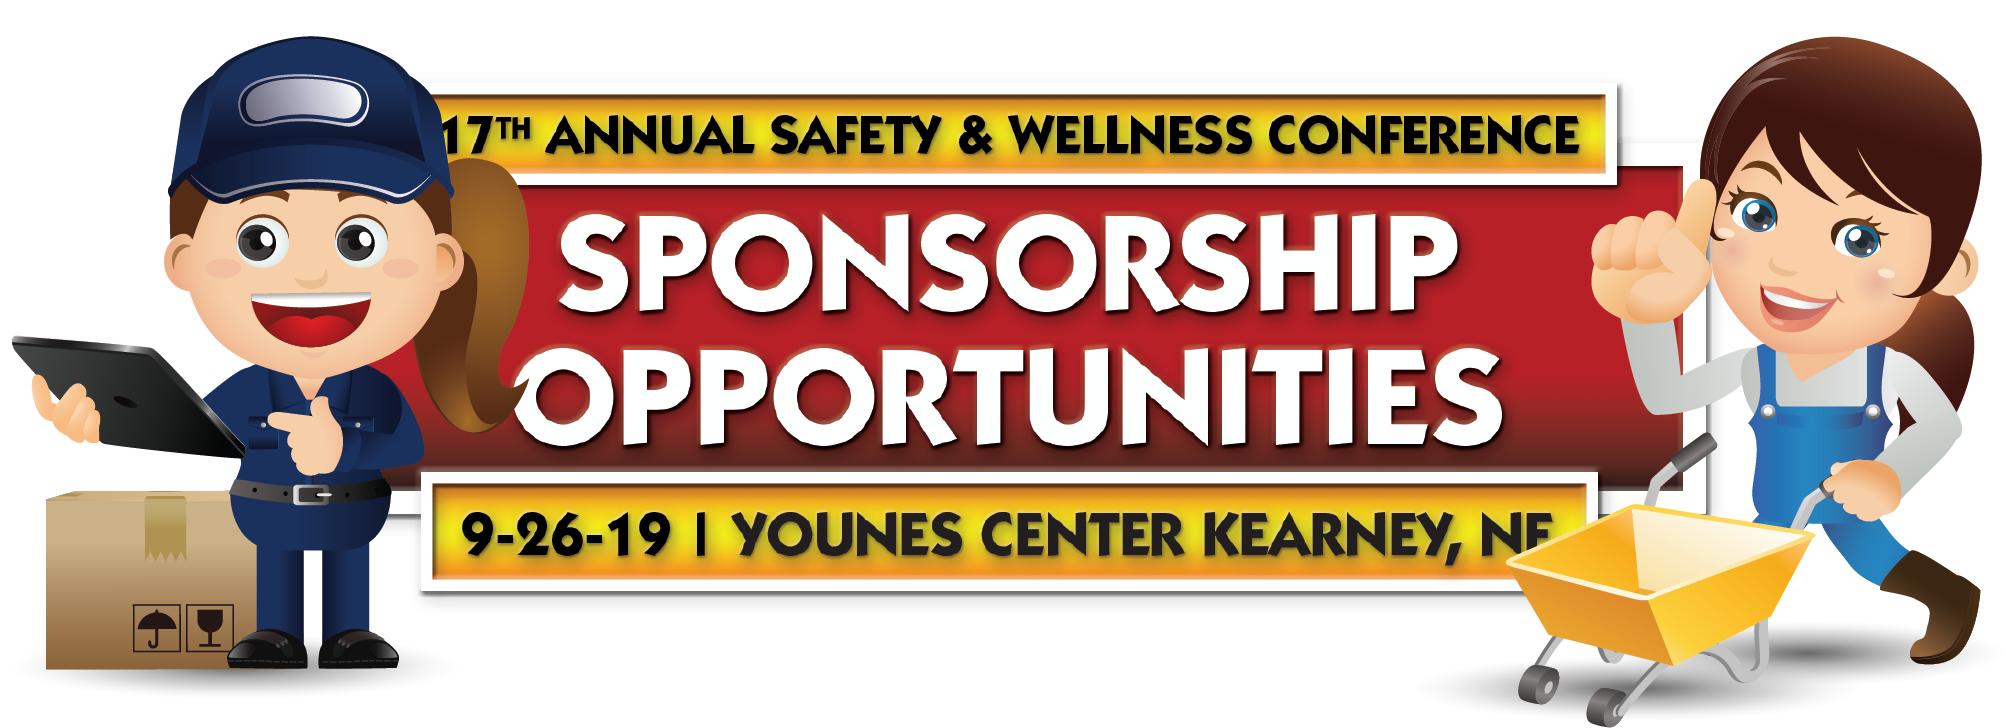 SWC19_Header_SponsorshipOpp.png